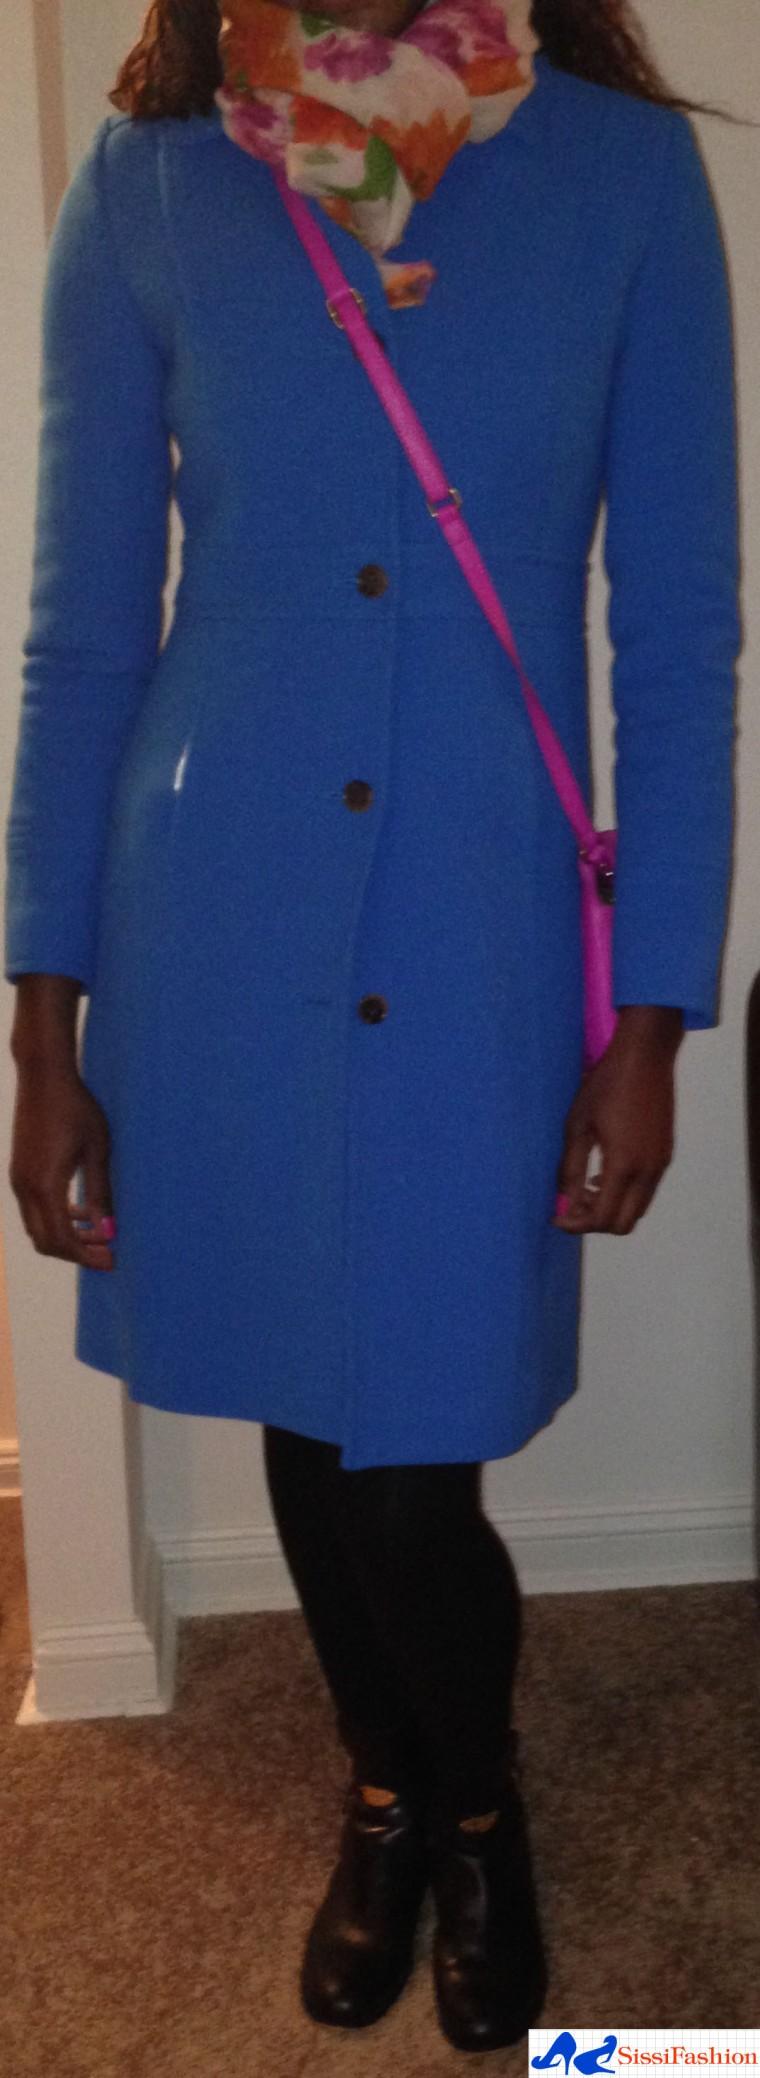 jcrew_lady_day_coat_ebelandi_27jan14